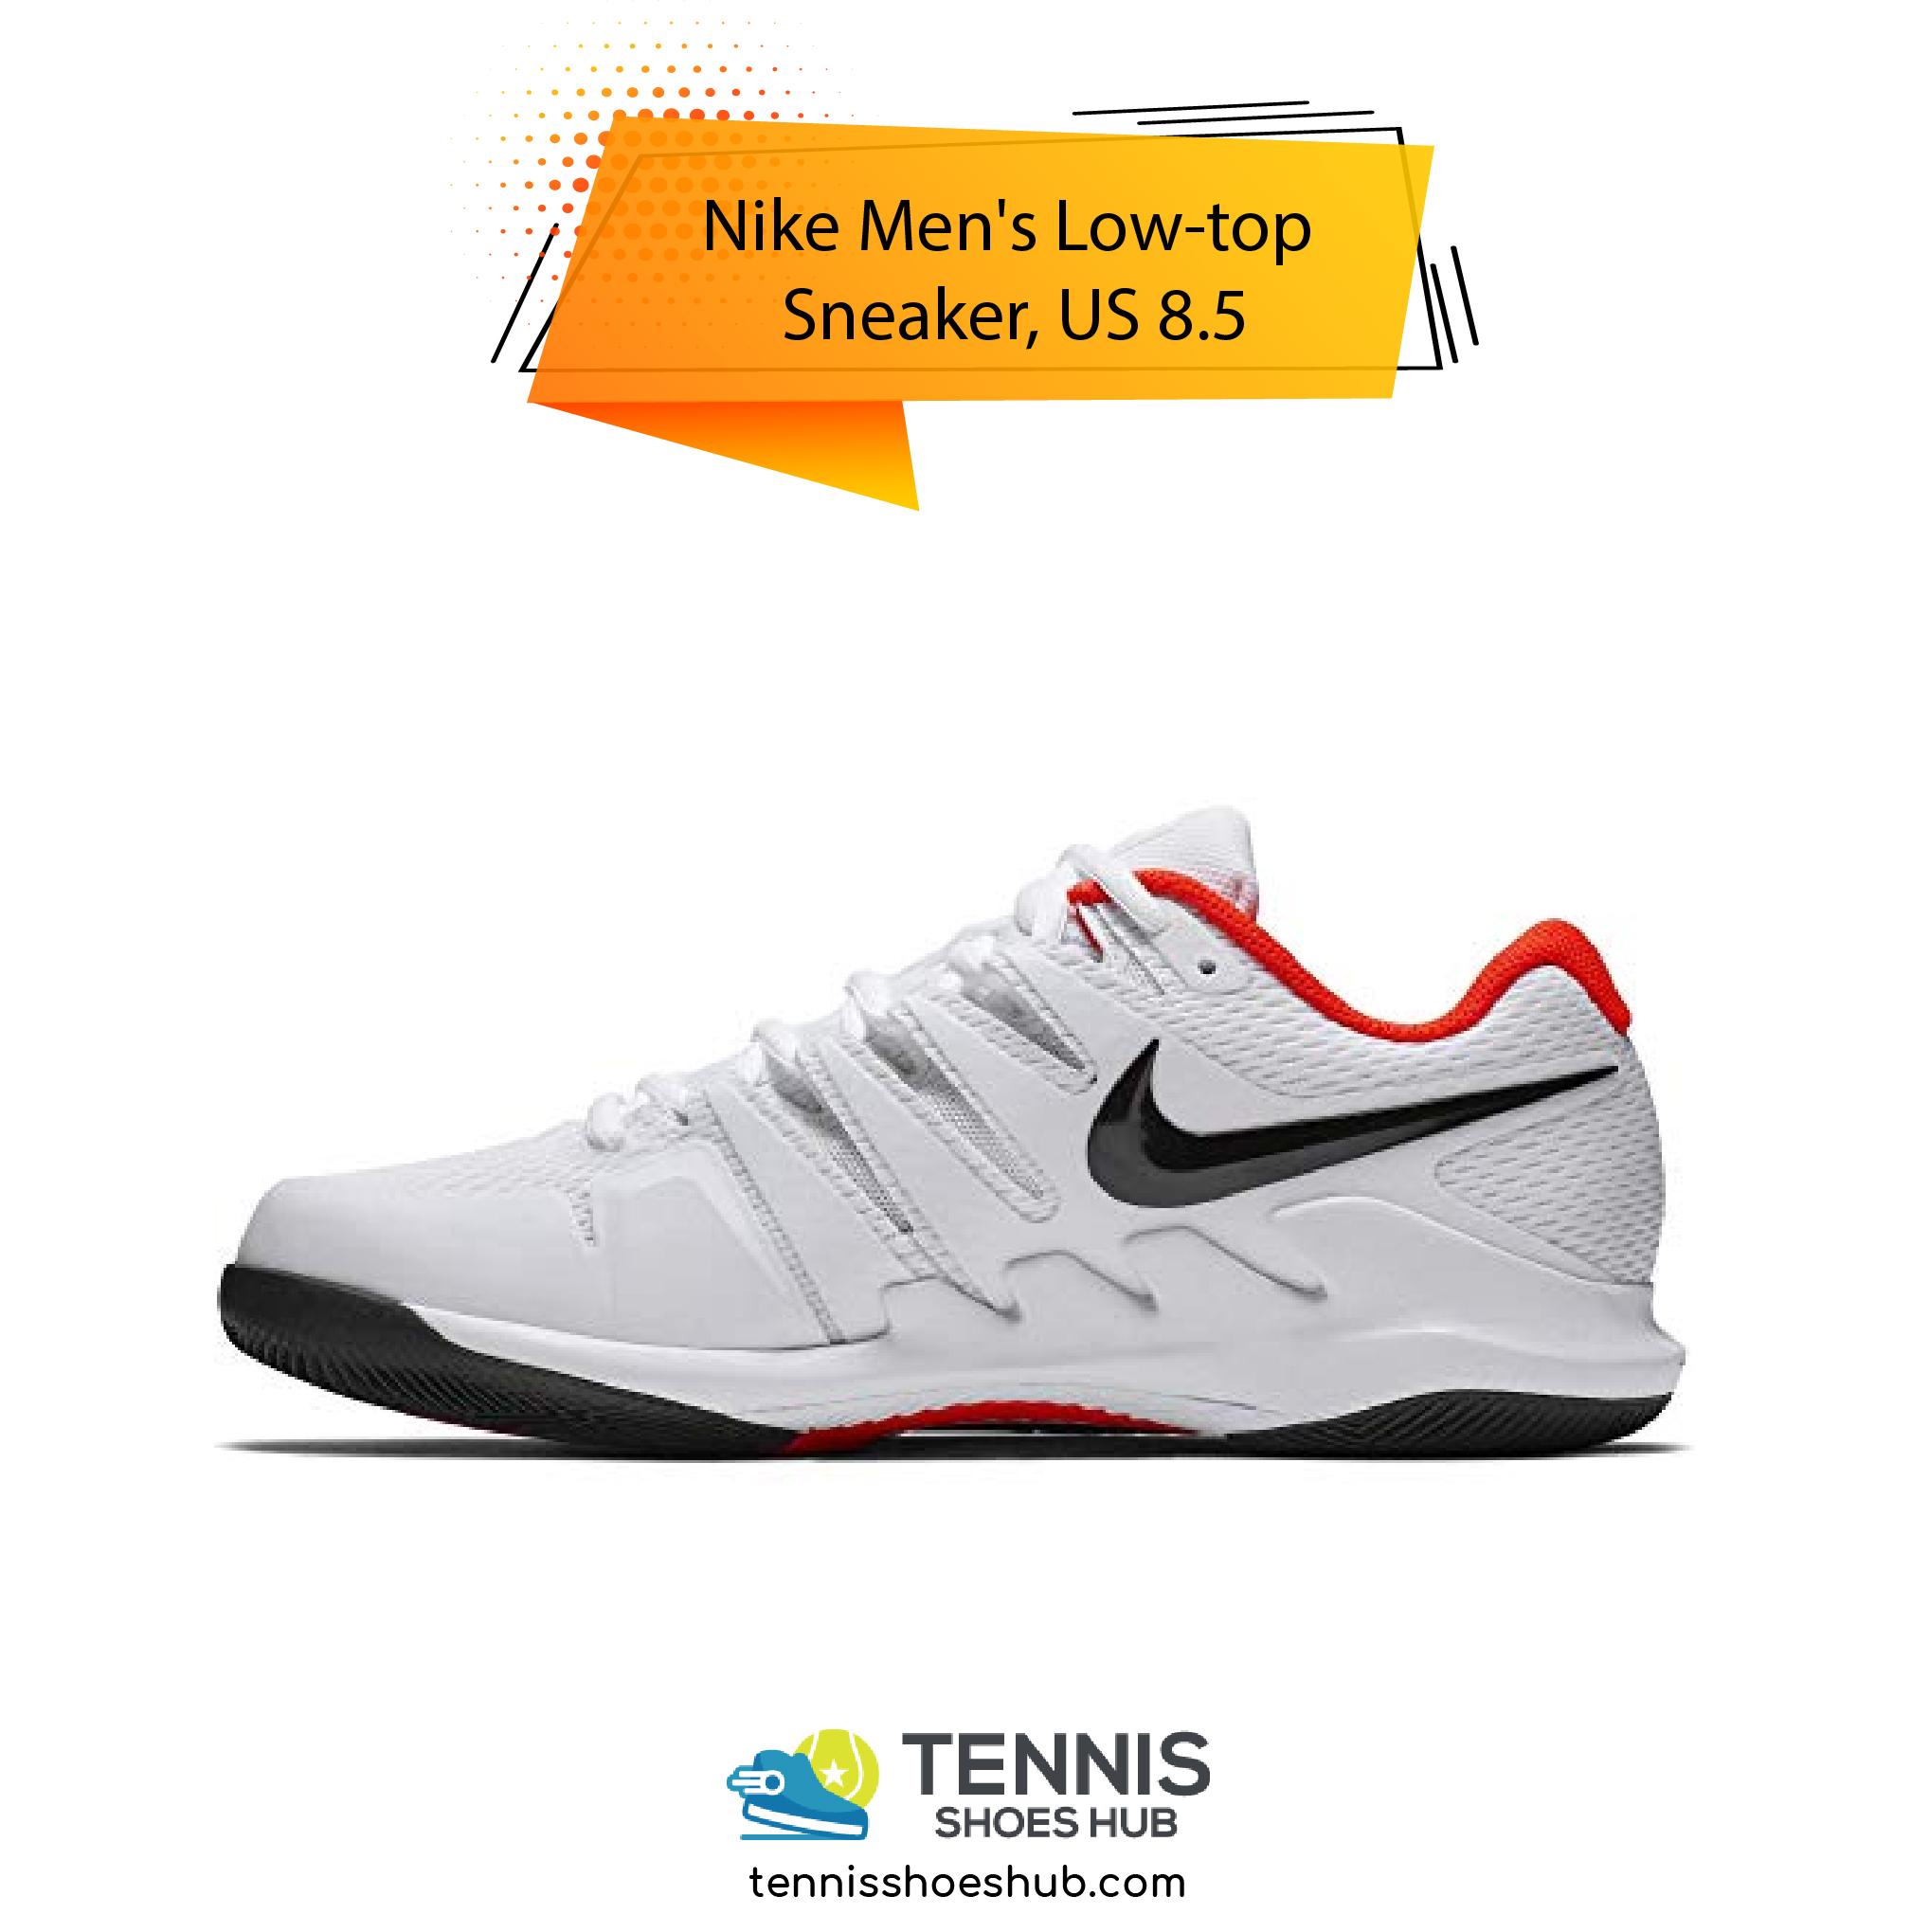 Nike Mens Low top Sneaker US 8.5 01